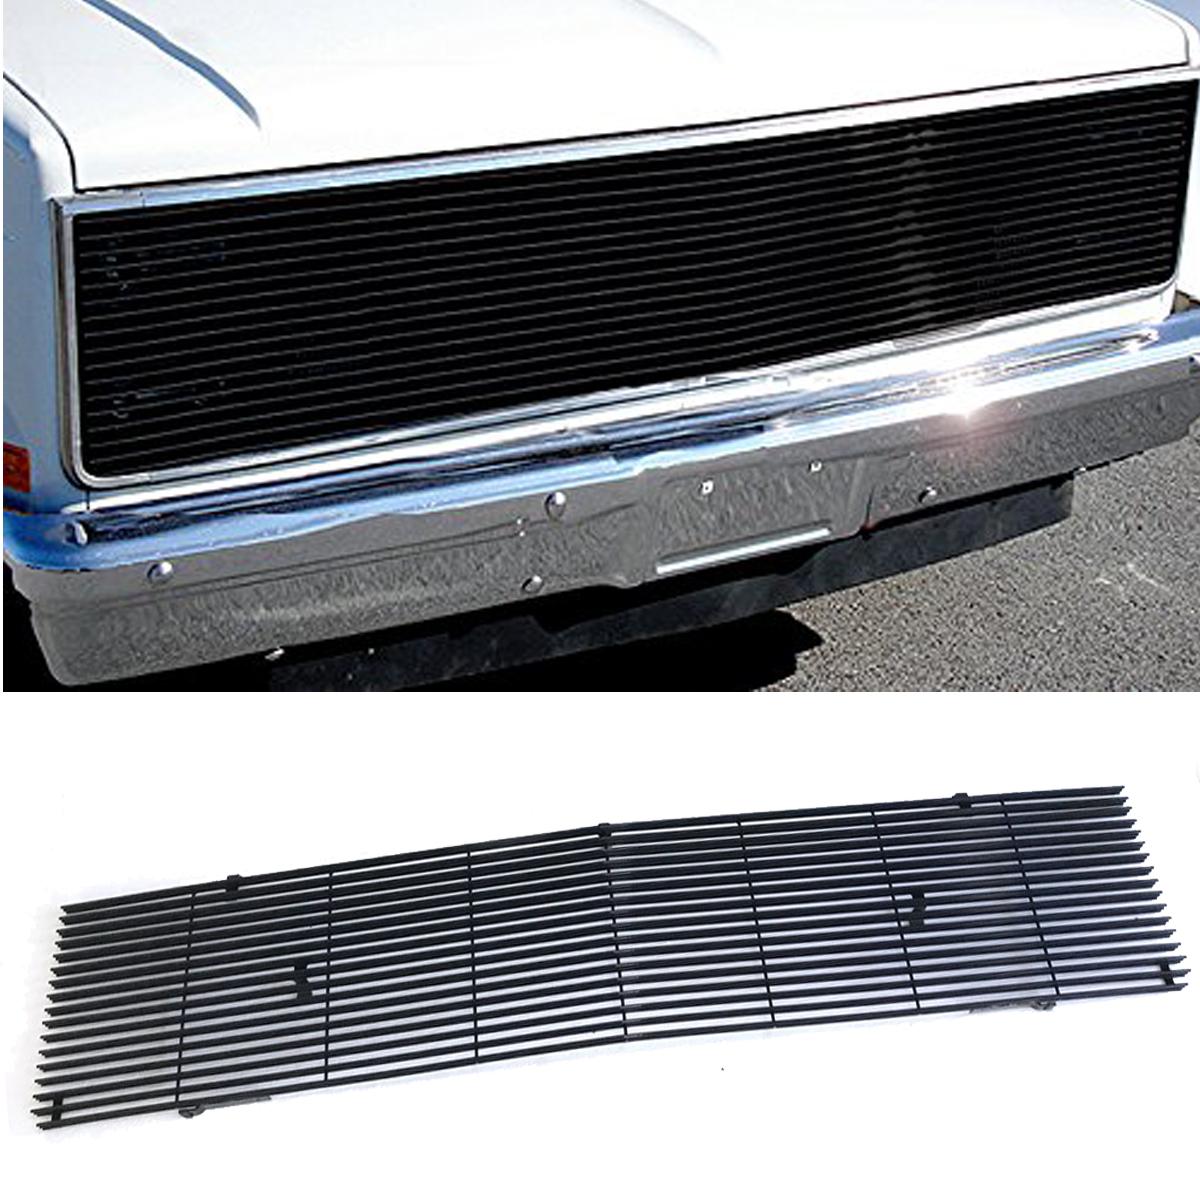 Phantom Style Grill For 81 87 Chevy Gmc Pickup Suburban Blazer C K Billet Grille Ebay